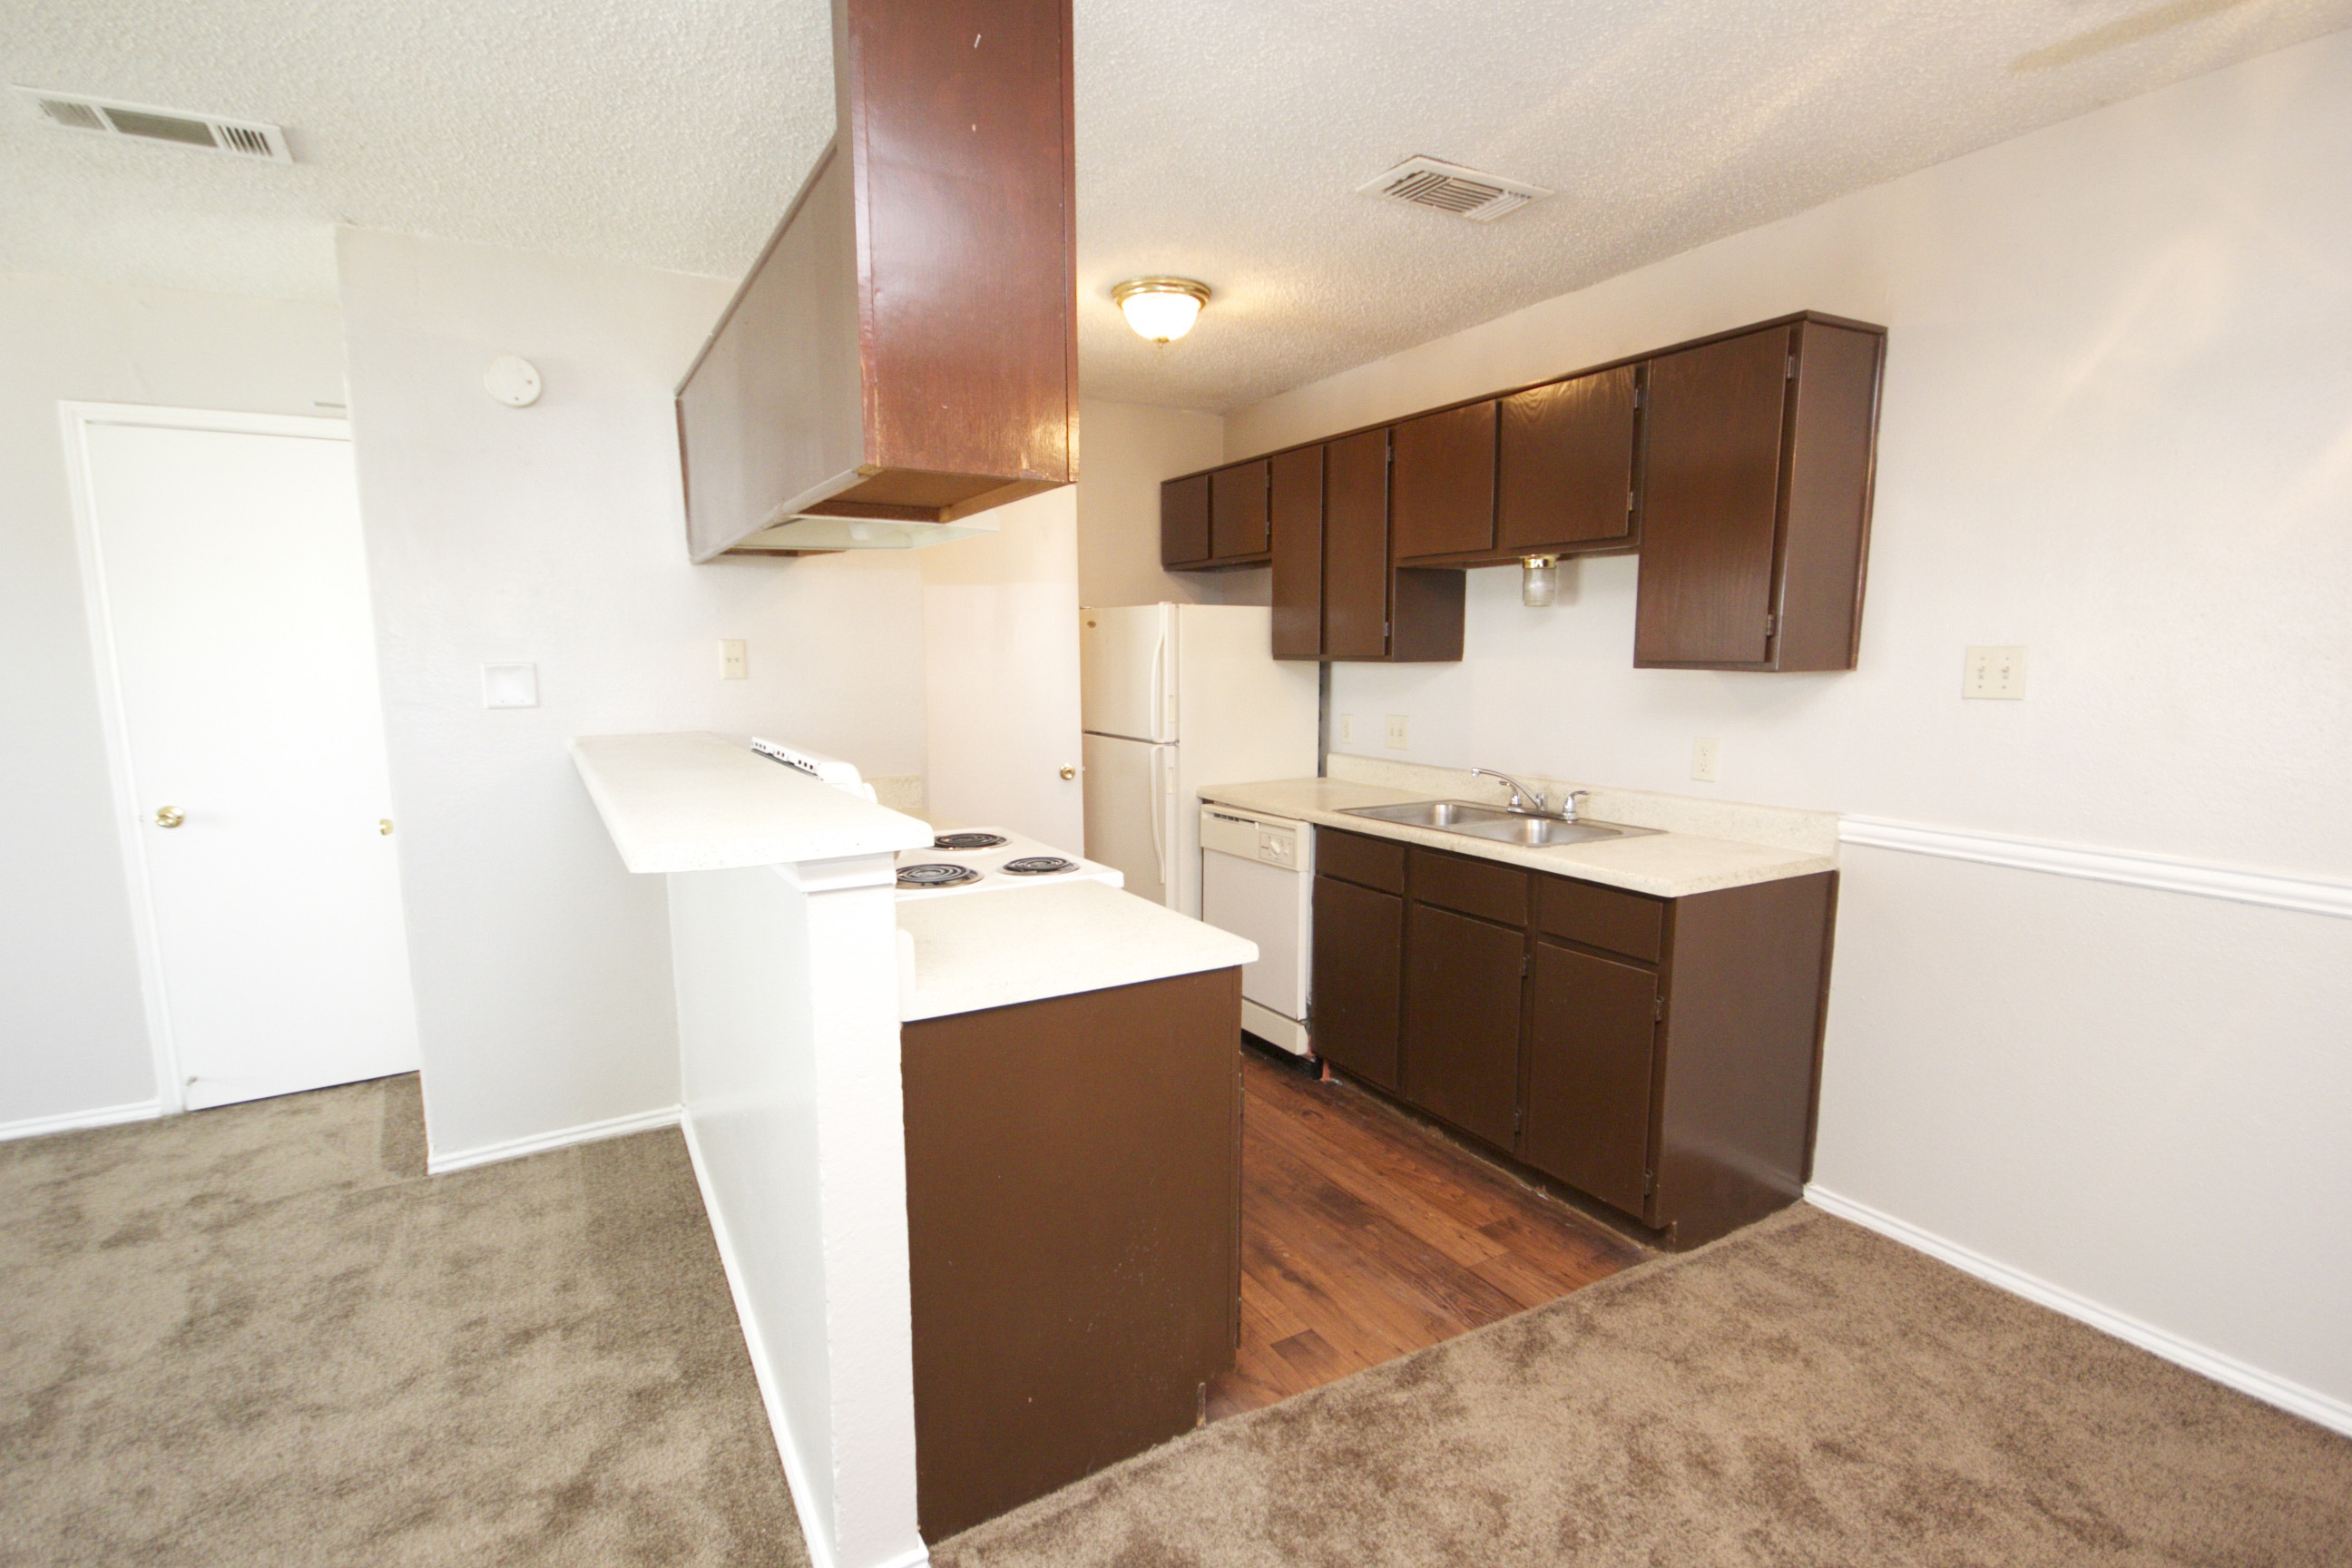 Fully-Equipped Kitchens at Quail Ridge Apartments in Grand Prairie, Texas